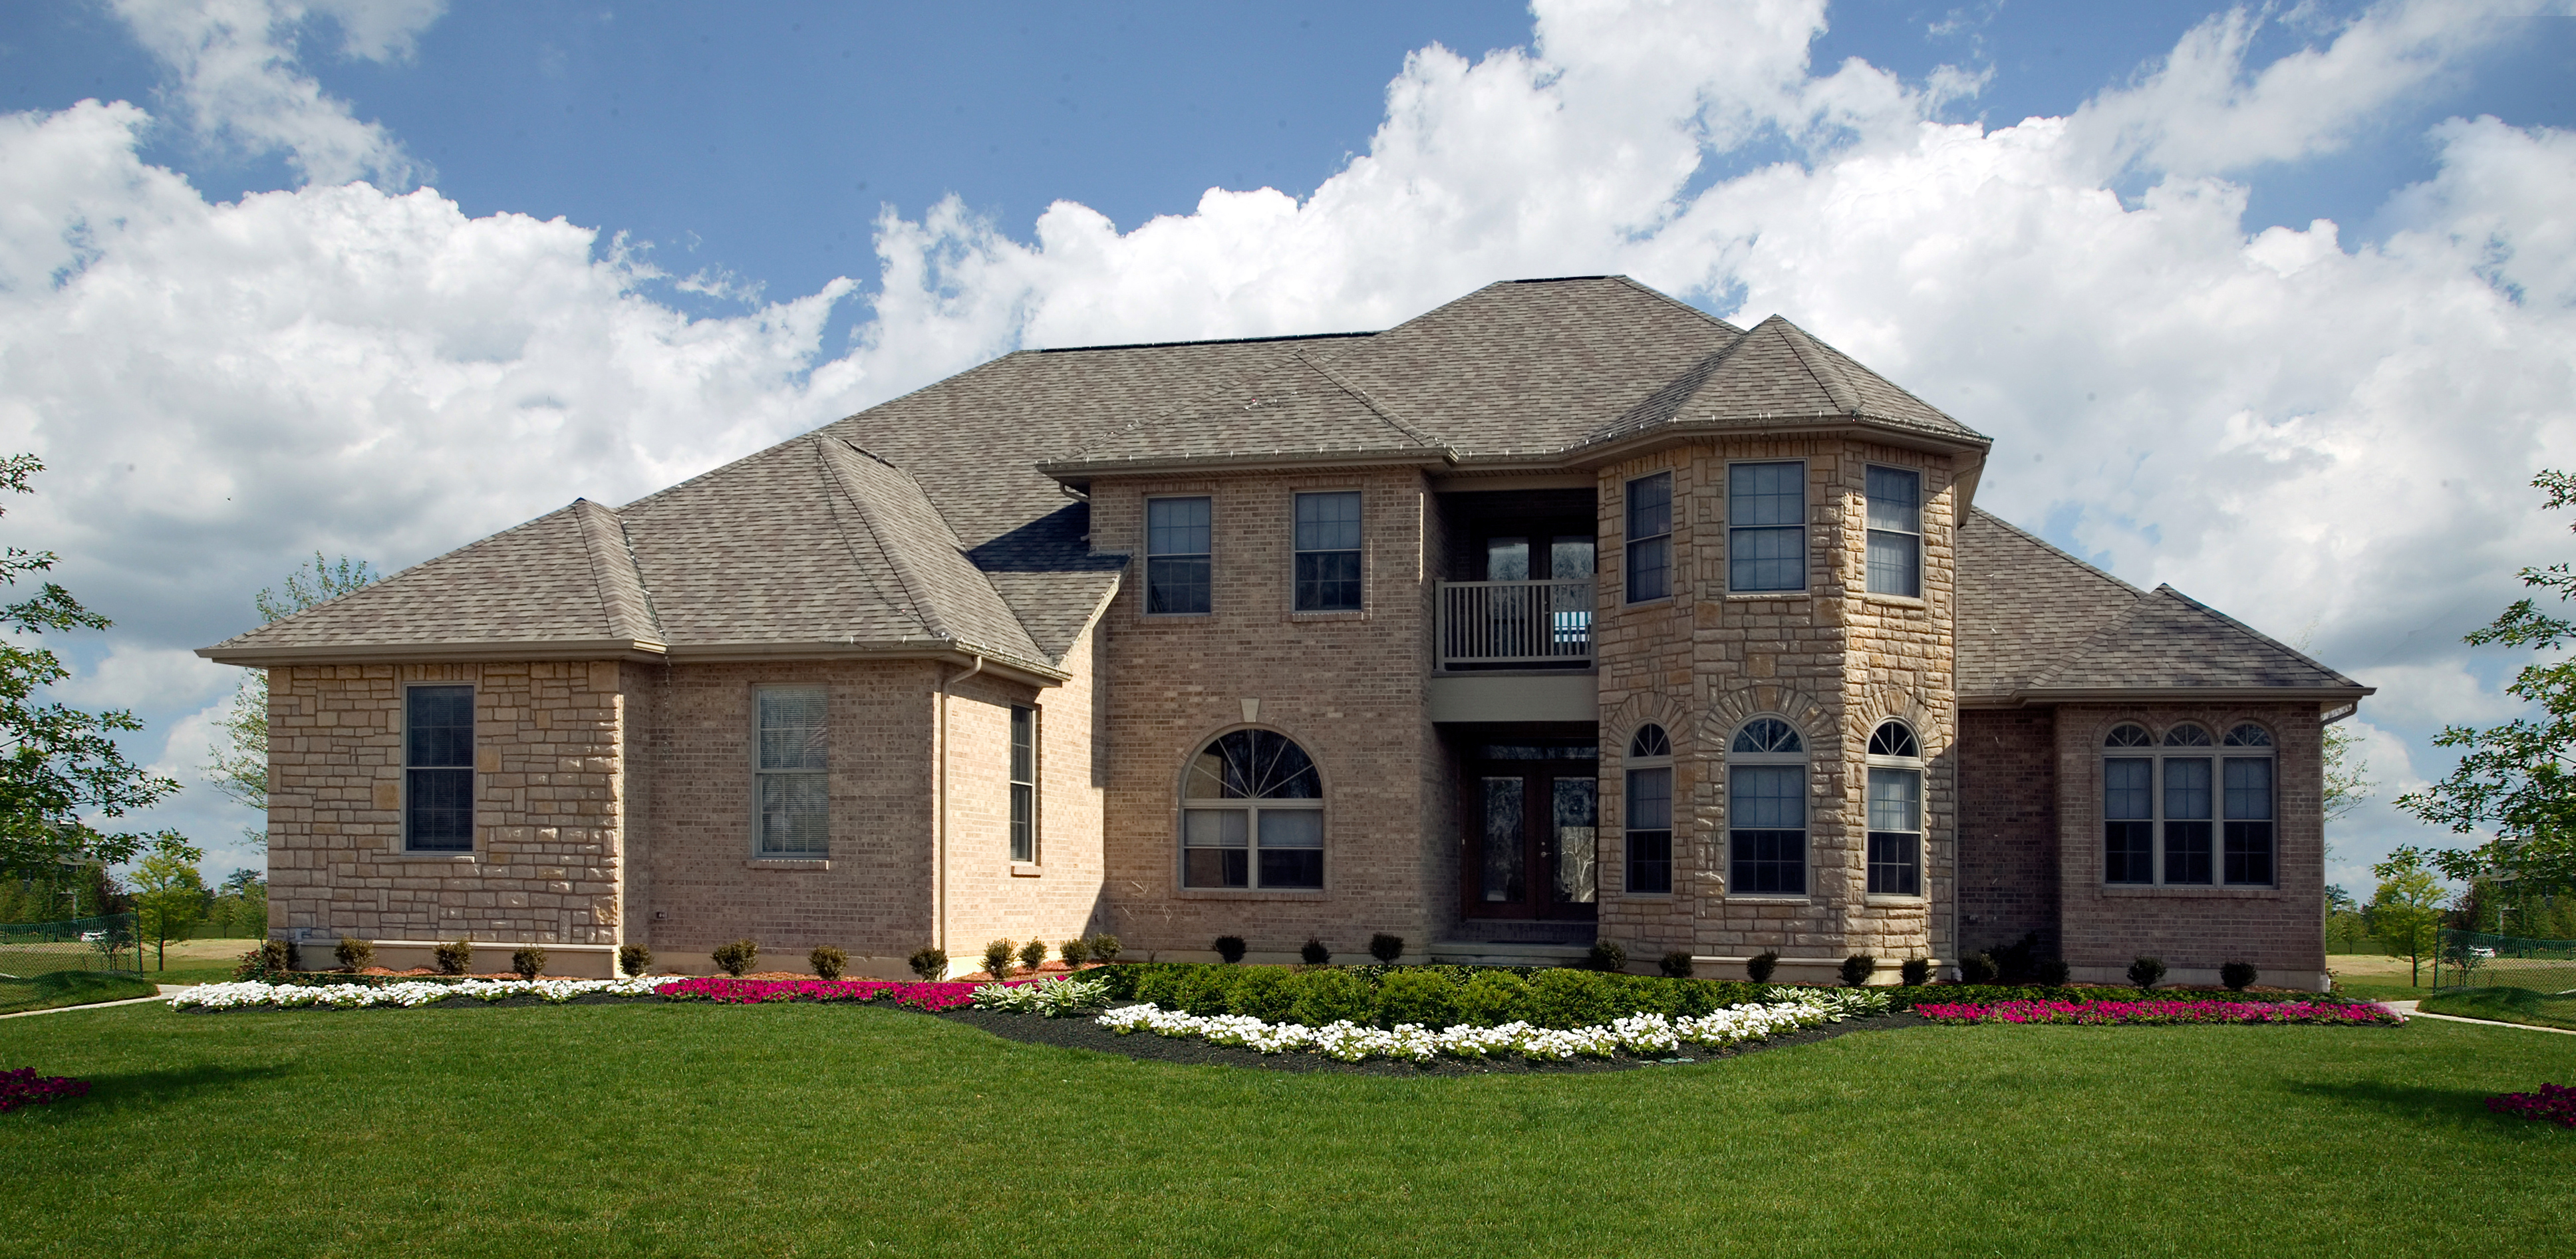 Anderson Custom Homes Cincinnati Ohio Custom Home Builder